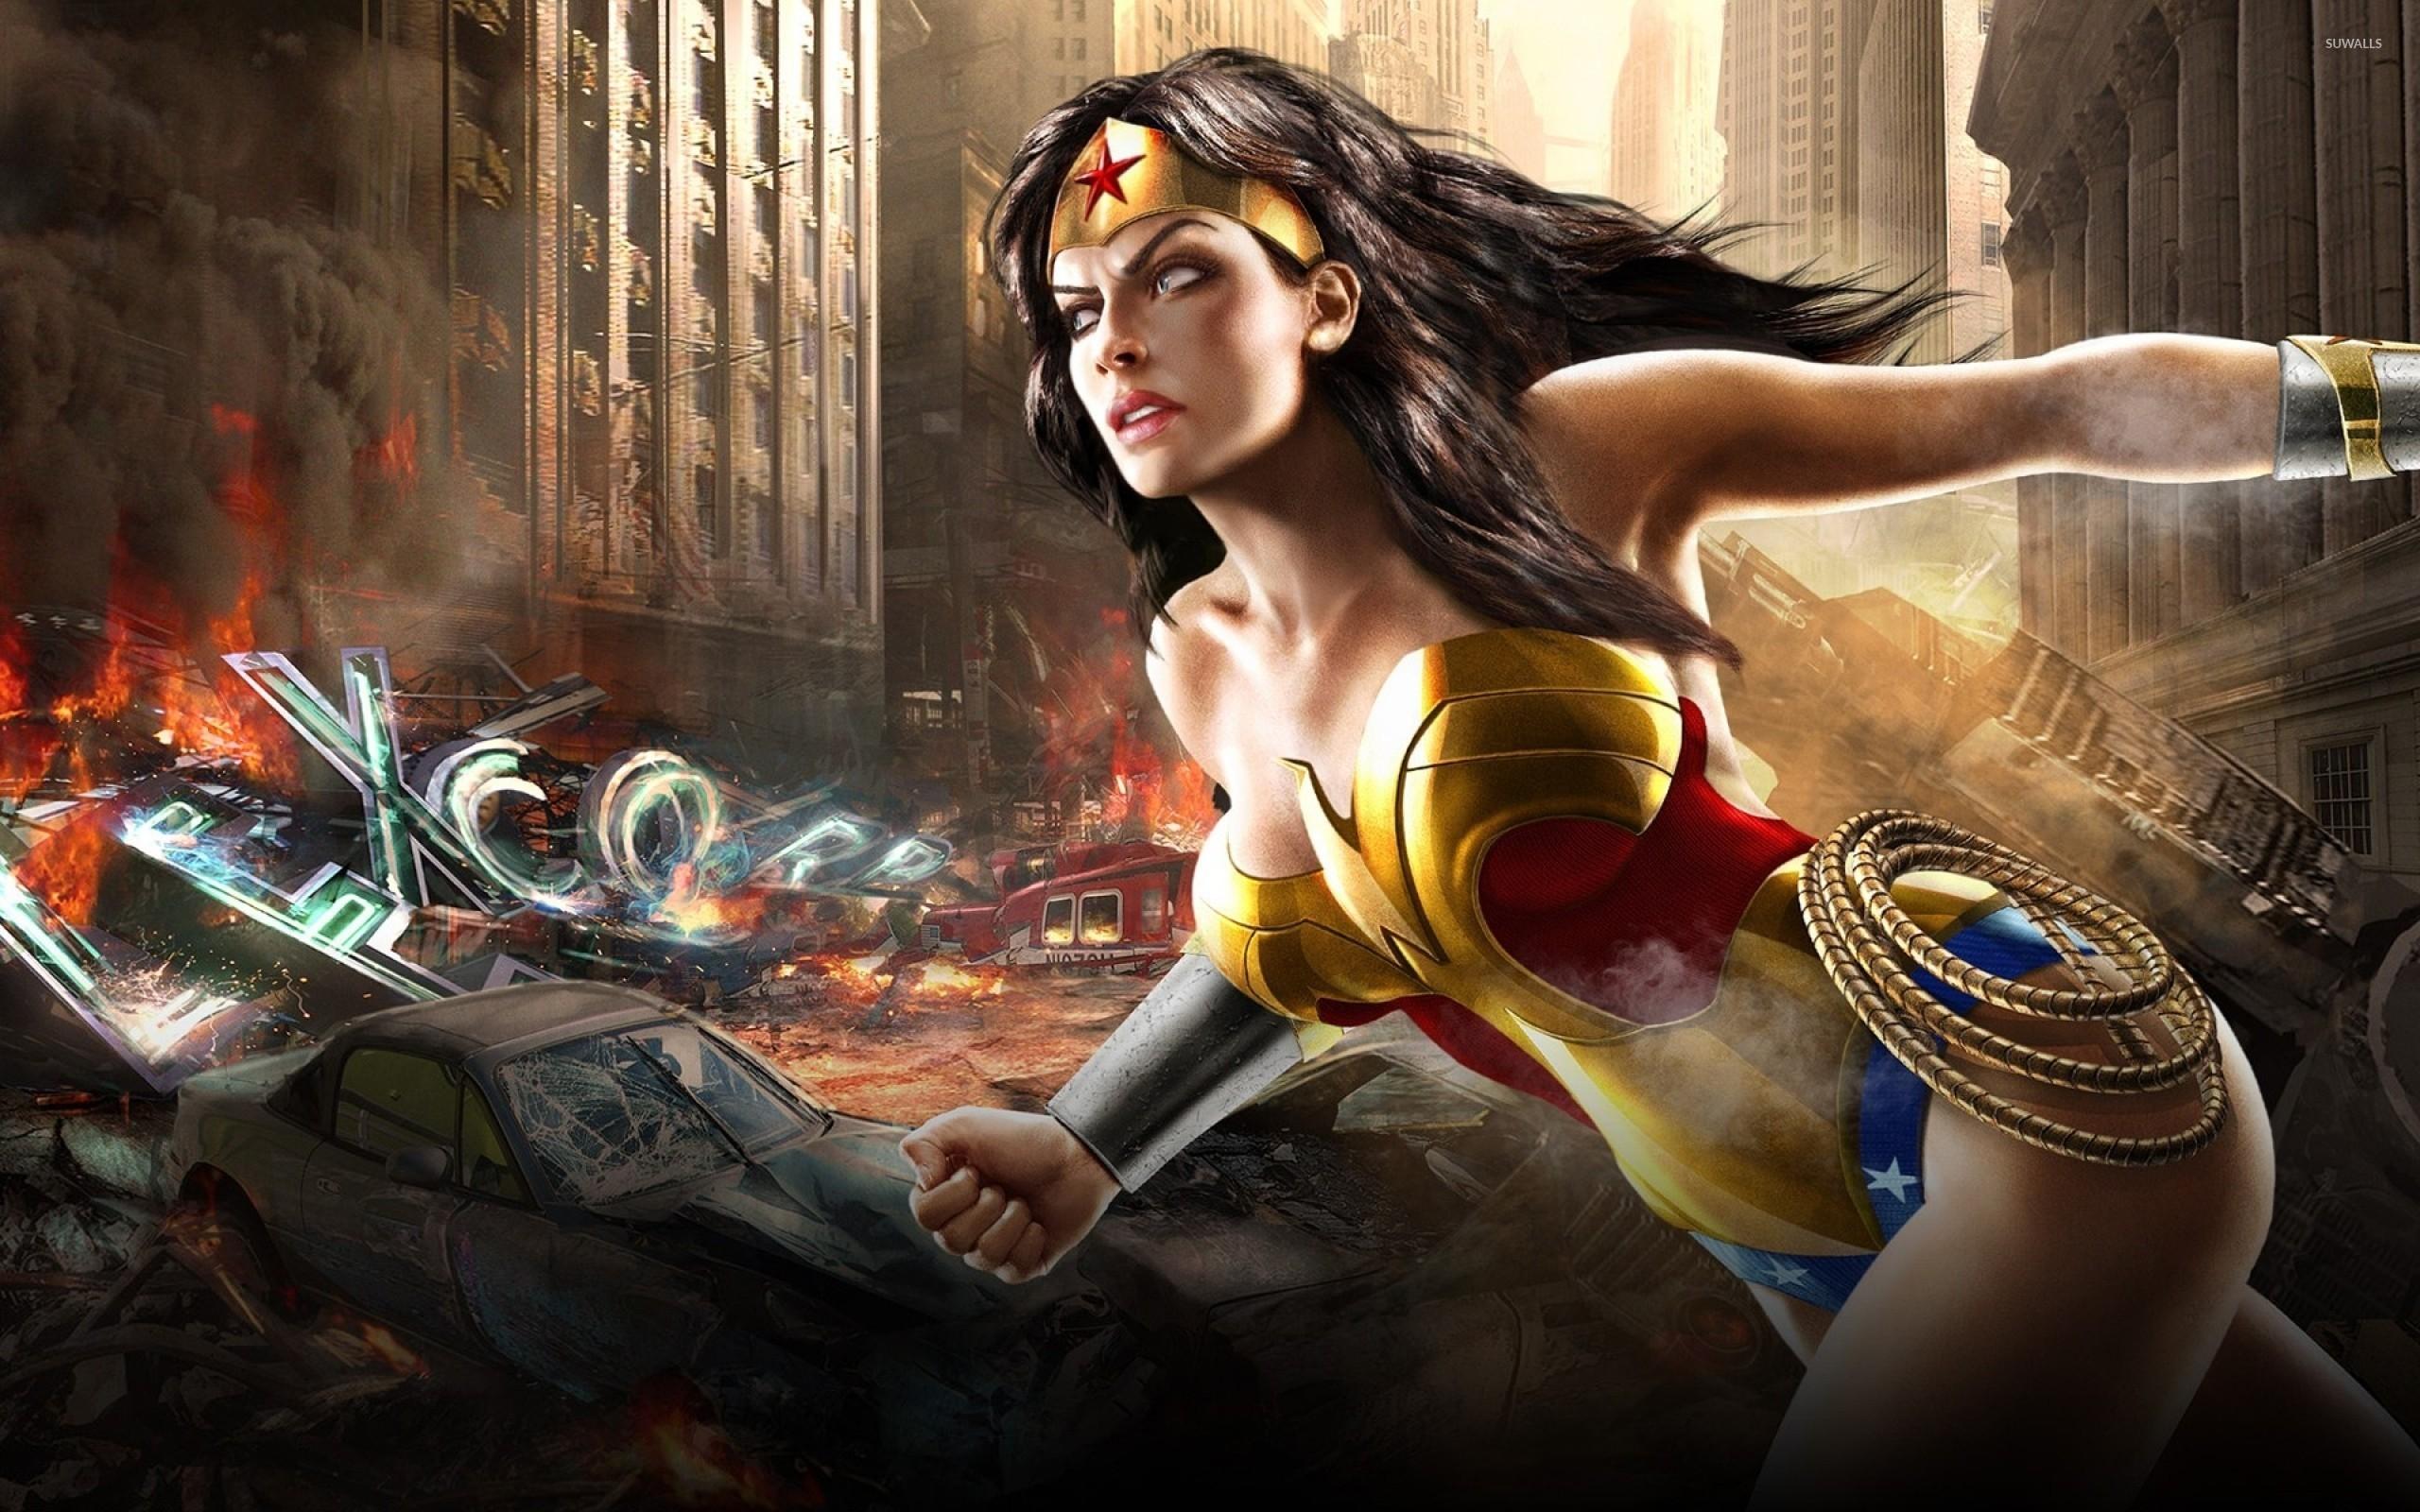 Wonder Woman Wallpaper Comic Wallpapers 27846